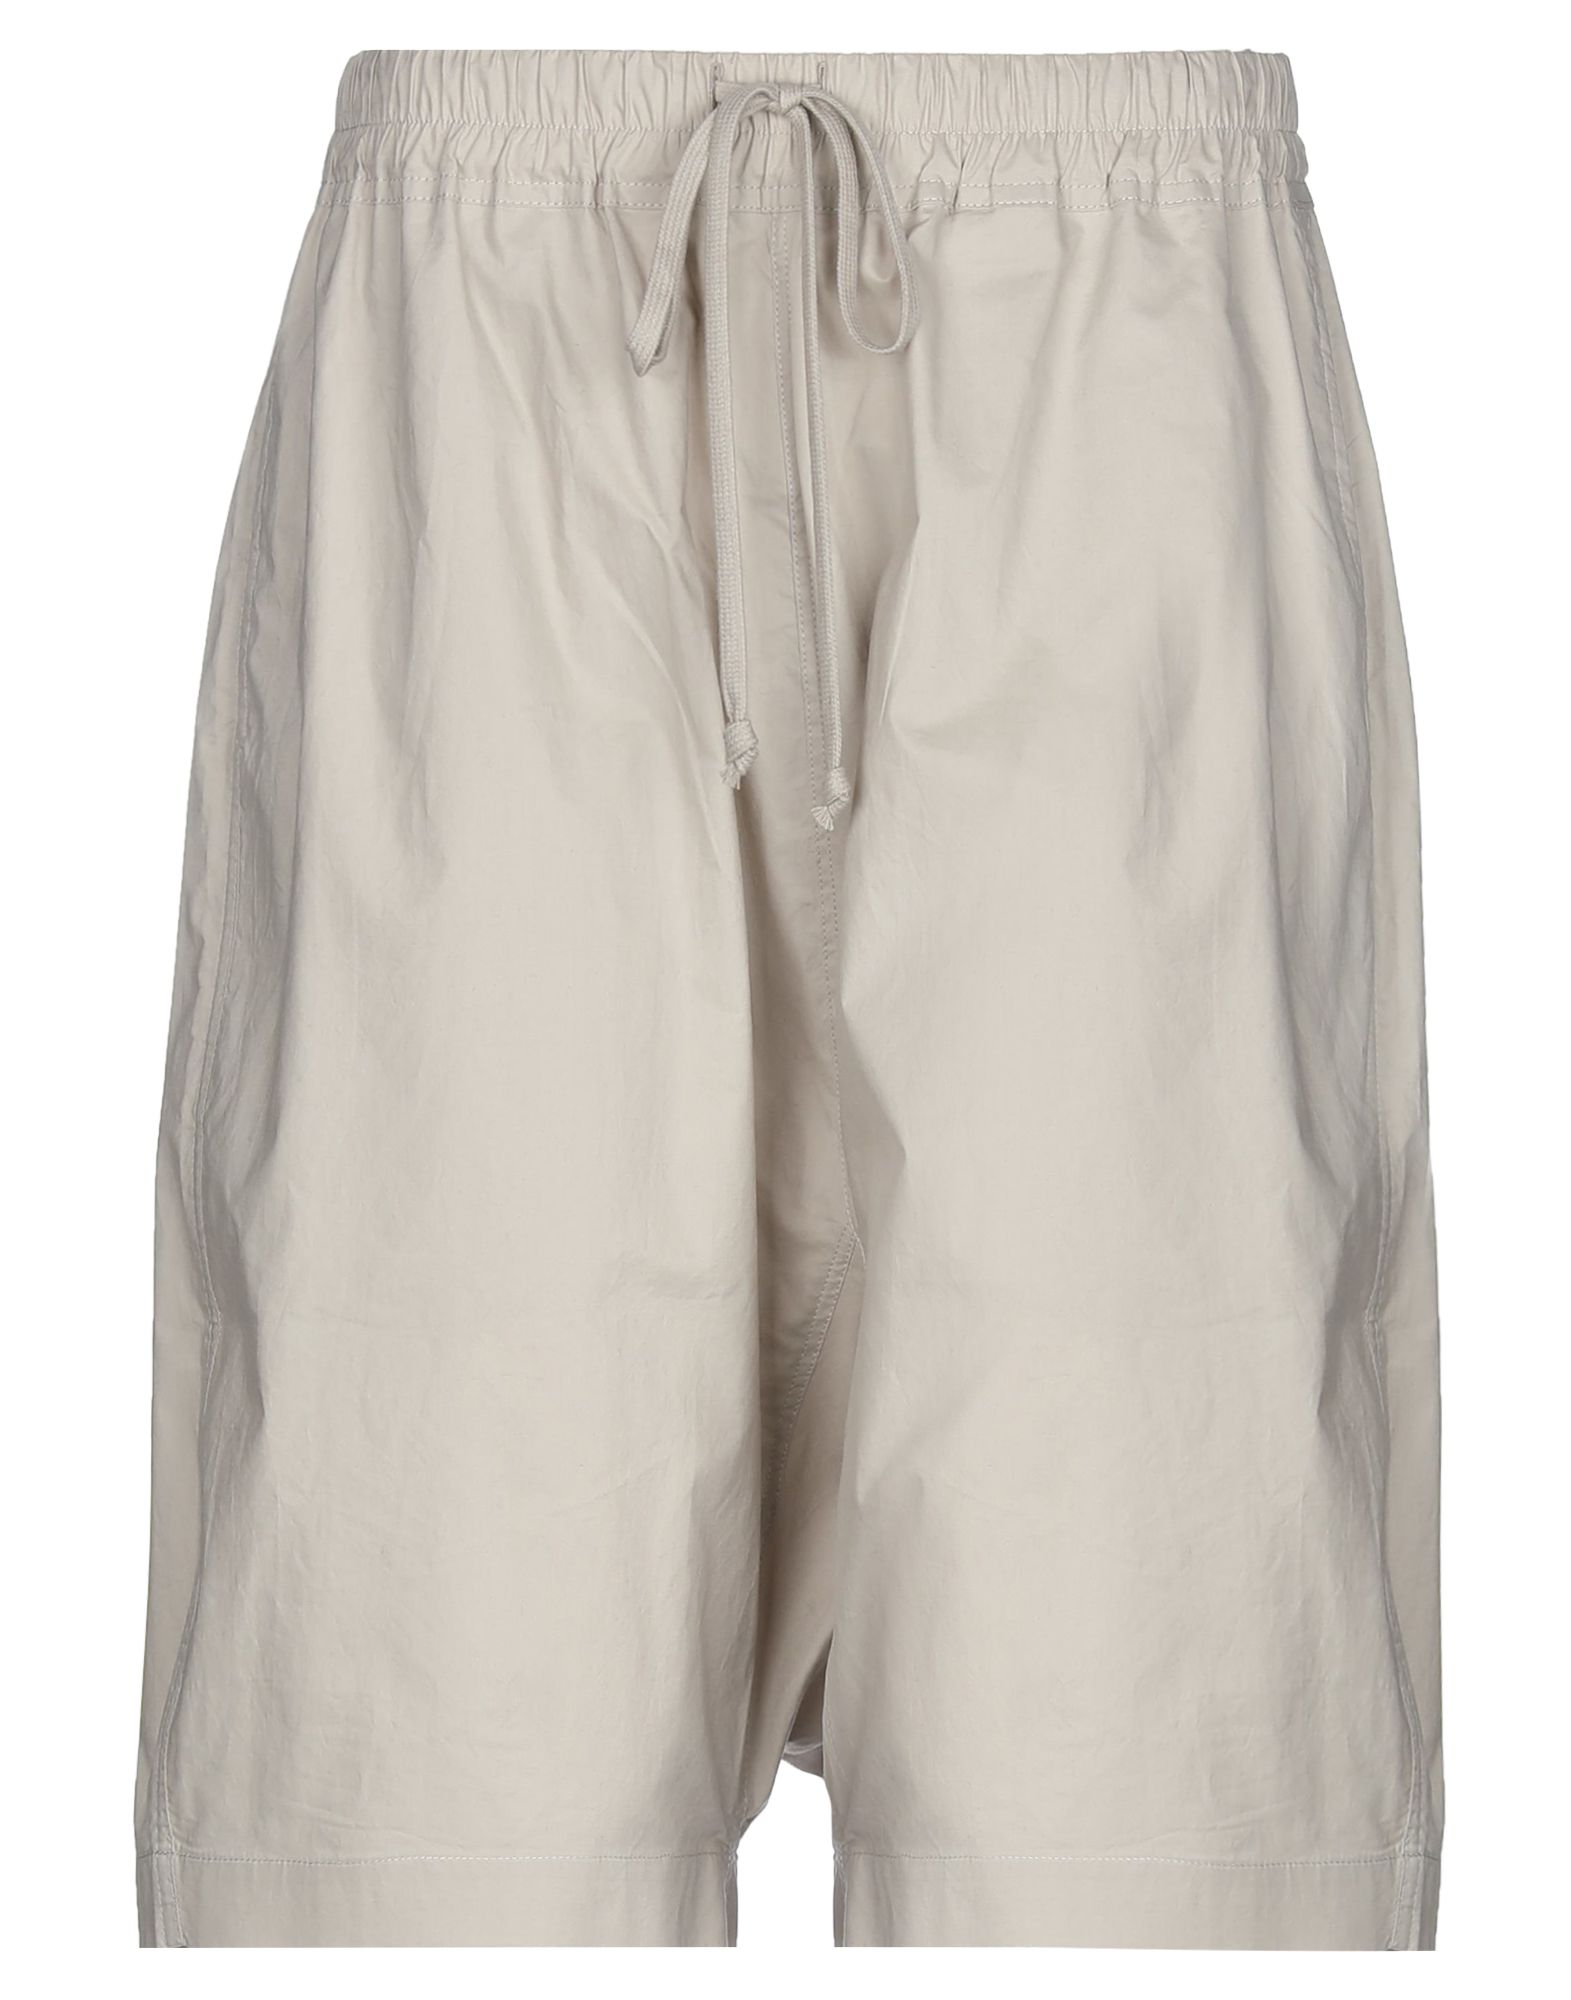 Pantalone Palazzo Drkshdw By Rick Owens Owens donna - 13359893FP